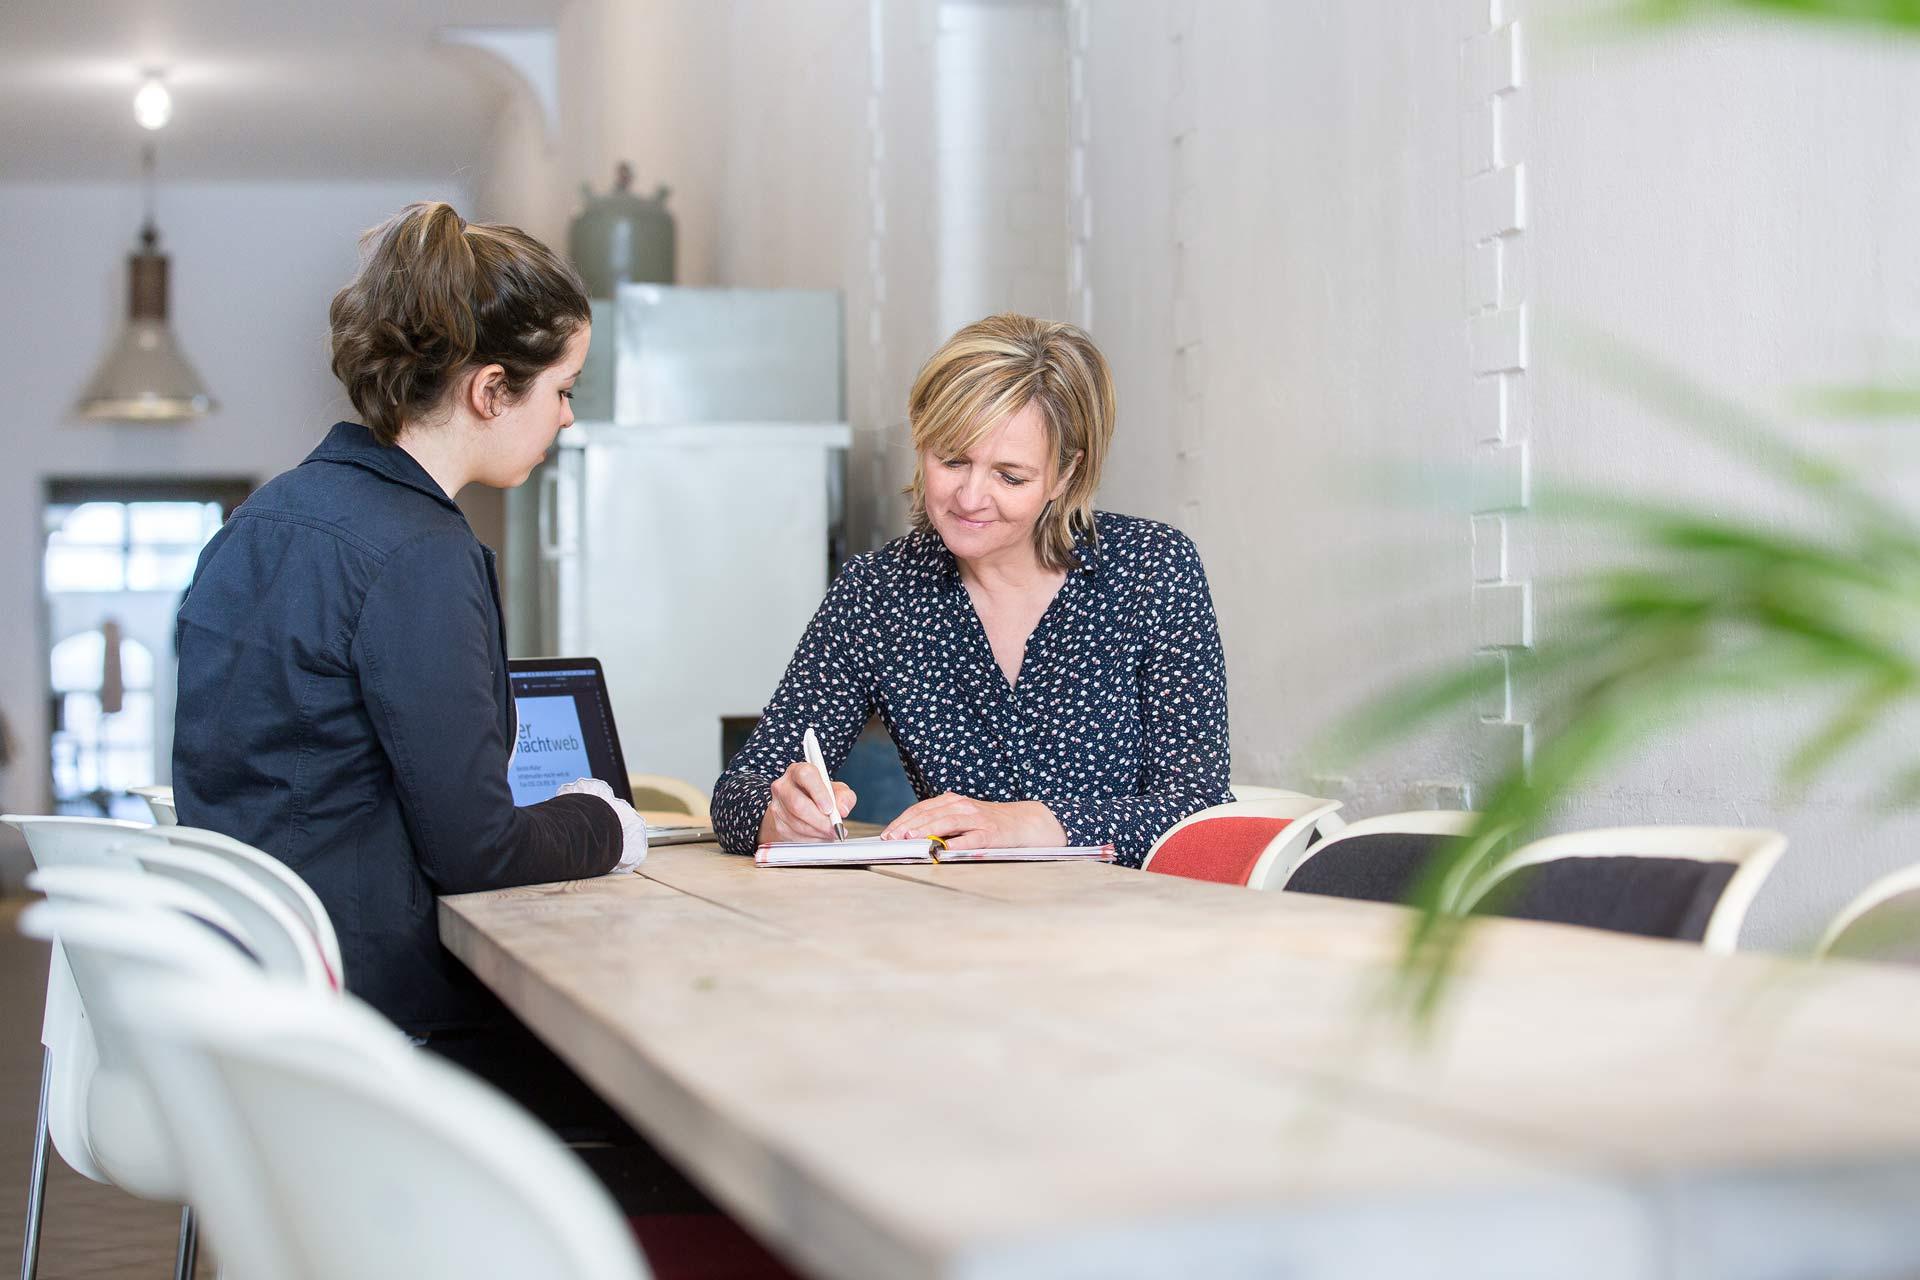 businessfotografie-berlin-fotos-fuer-solounternehmer-selbstaendige